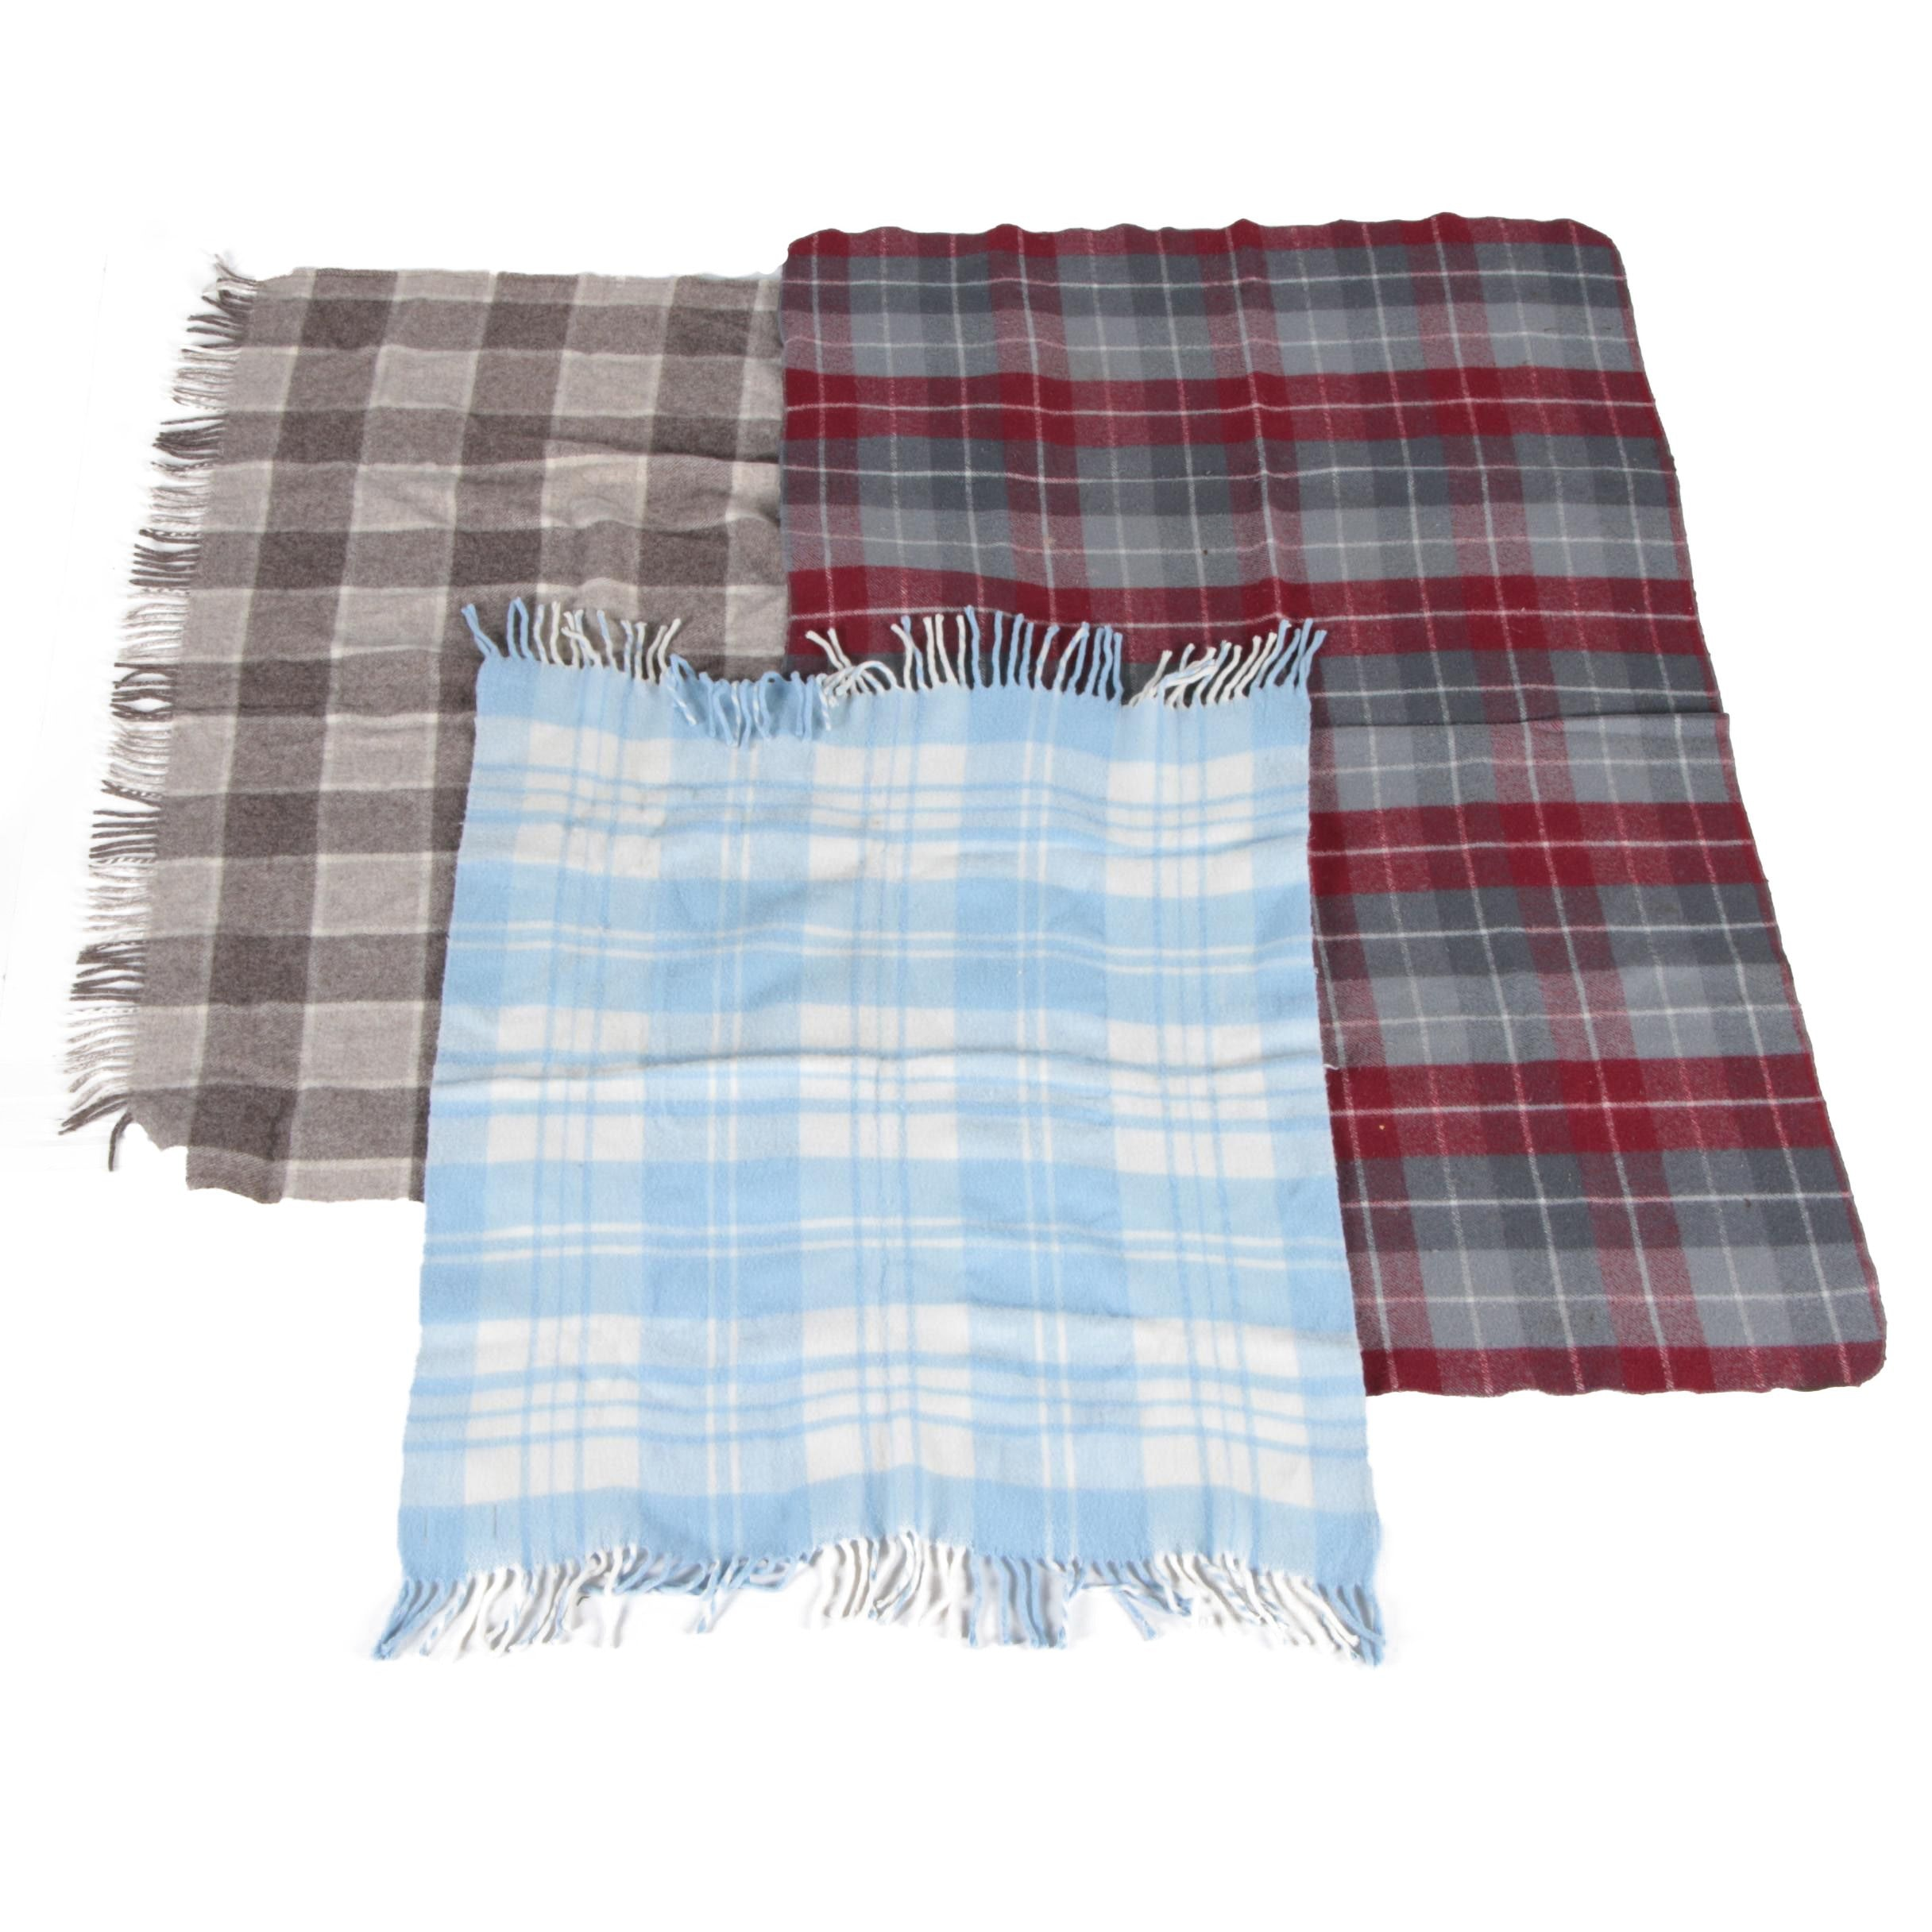 Vintage Glencairn and Carldyke Wool Blankets and Plaid Throw